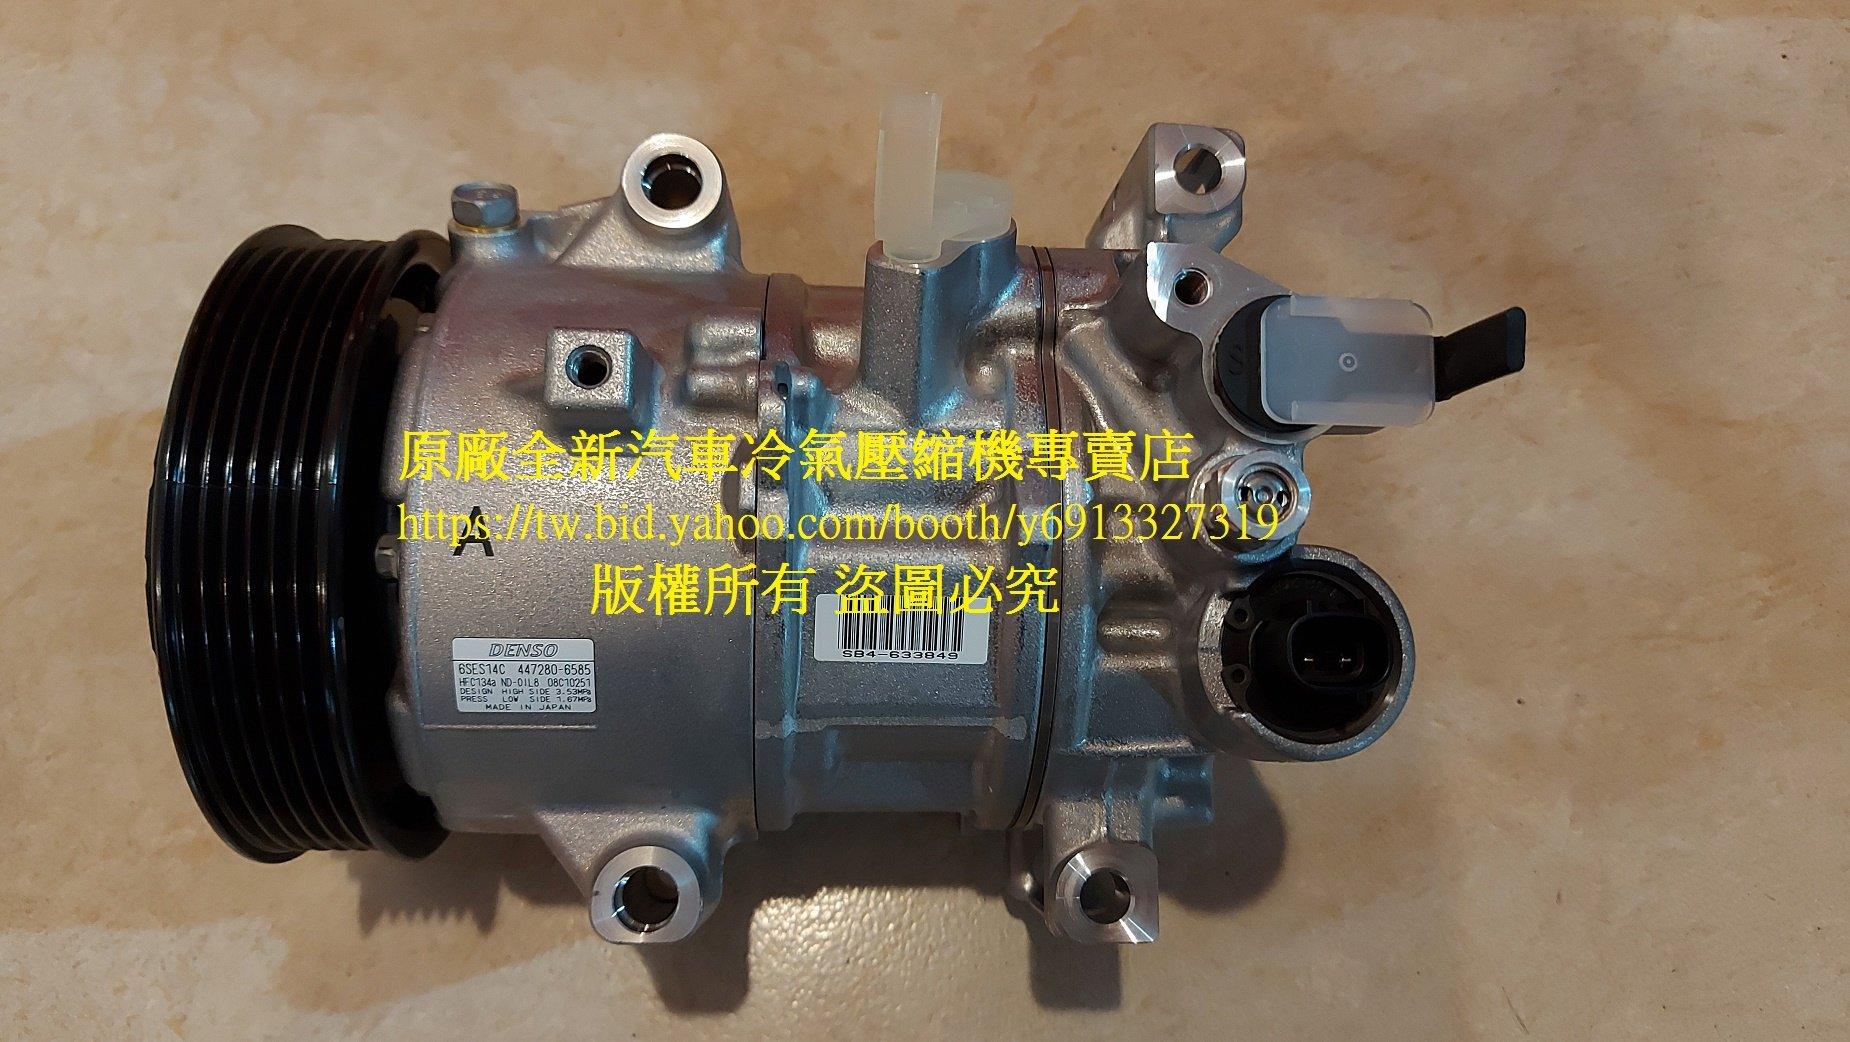 TOYOTA 豐田 ALTIS (第三代) 1.8L 原廠全新汽車冷氣壓縮機 (適用於2014年~2019年車款)